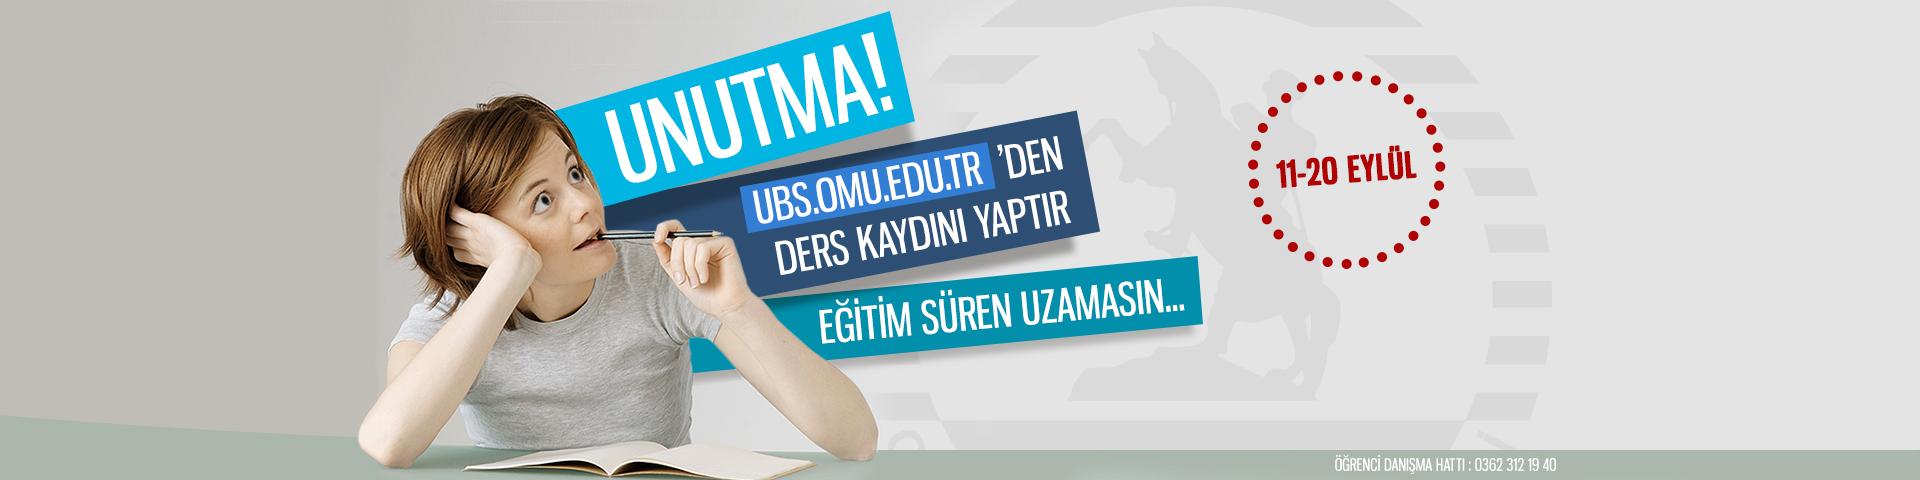 http://www.omu.edu.tr/sites/default/files/files/guz_yariyili_ogrenci_ders_kayit_takvimi/derskayit-slider.jpg